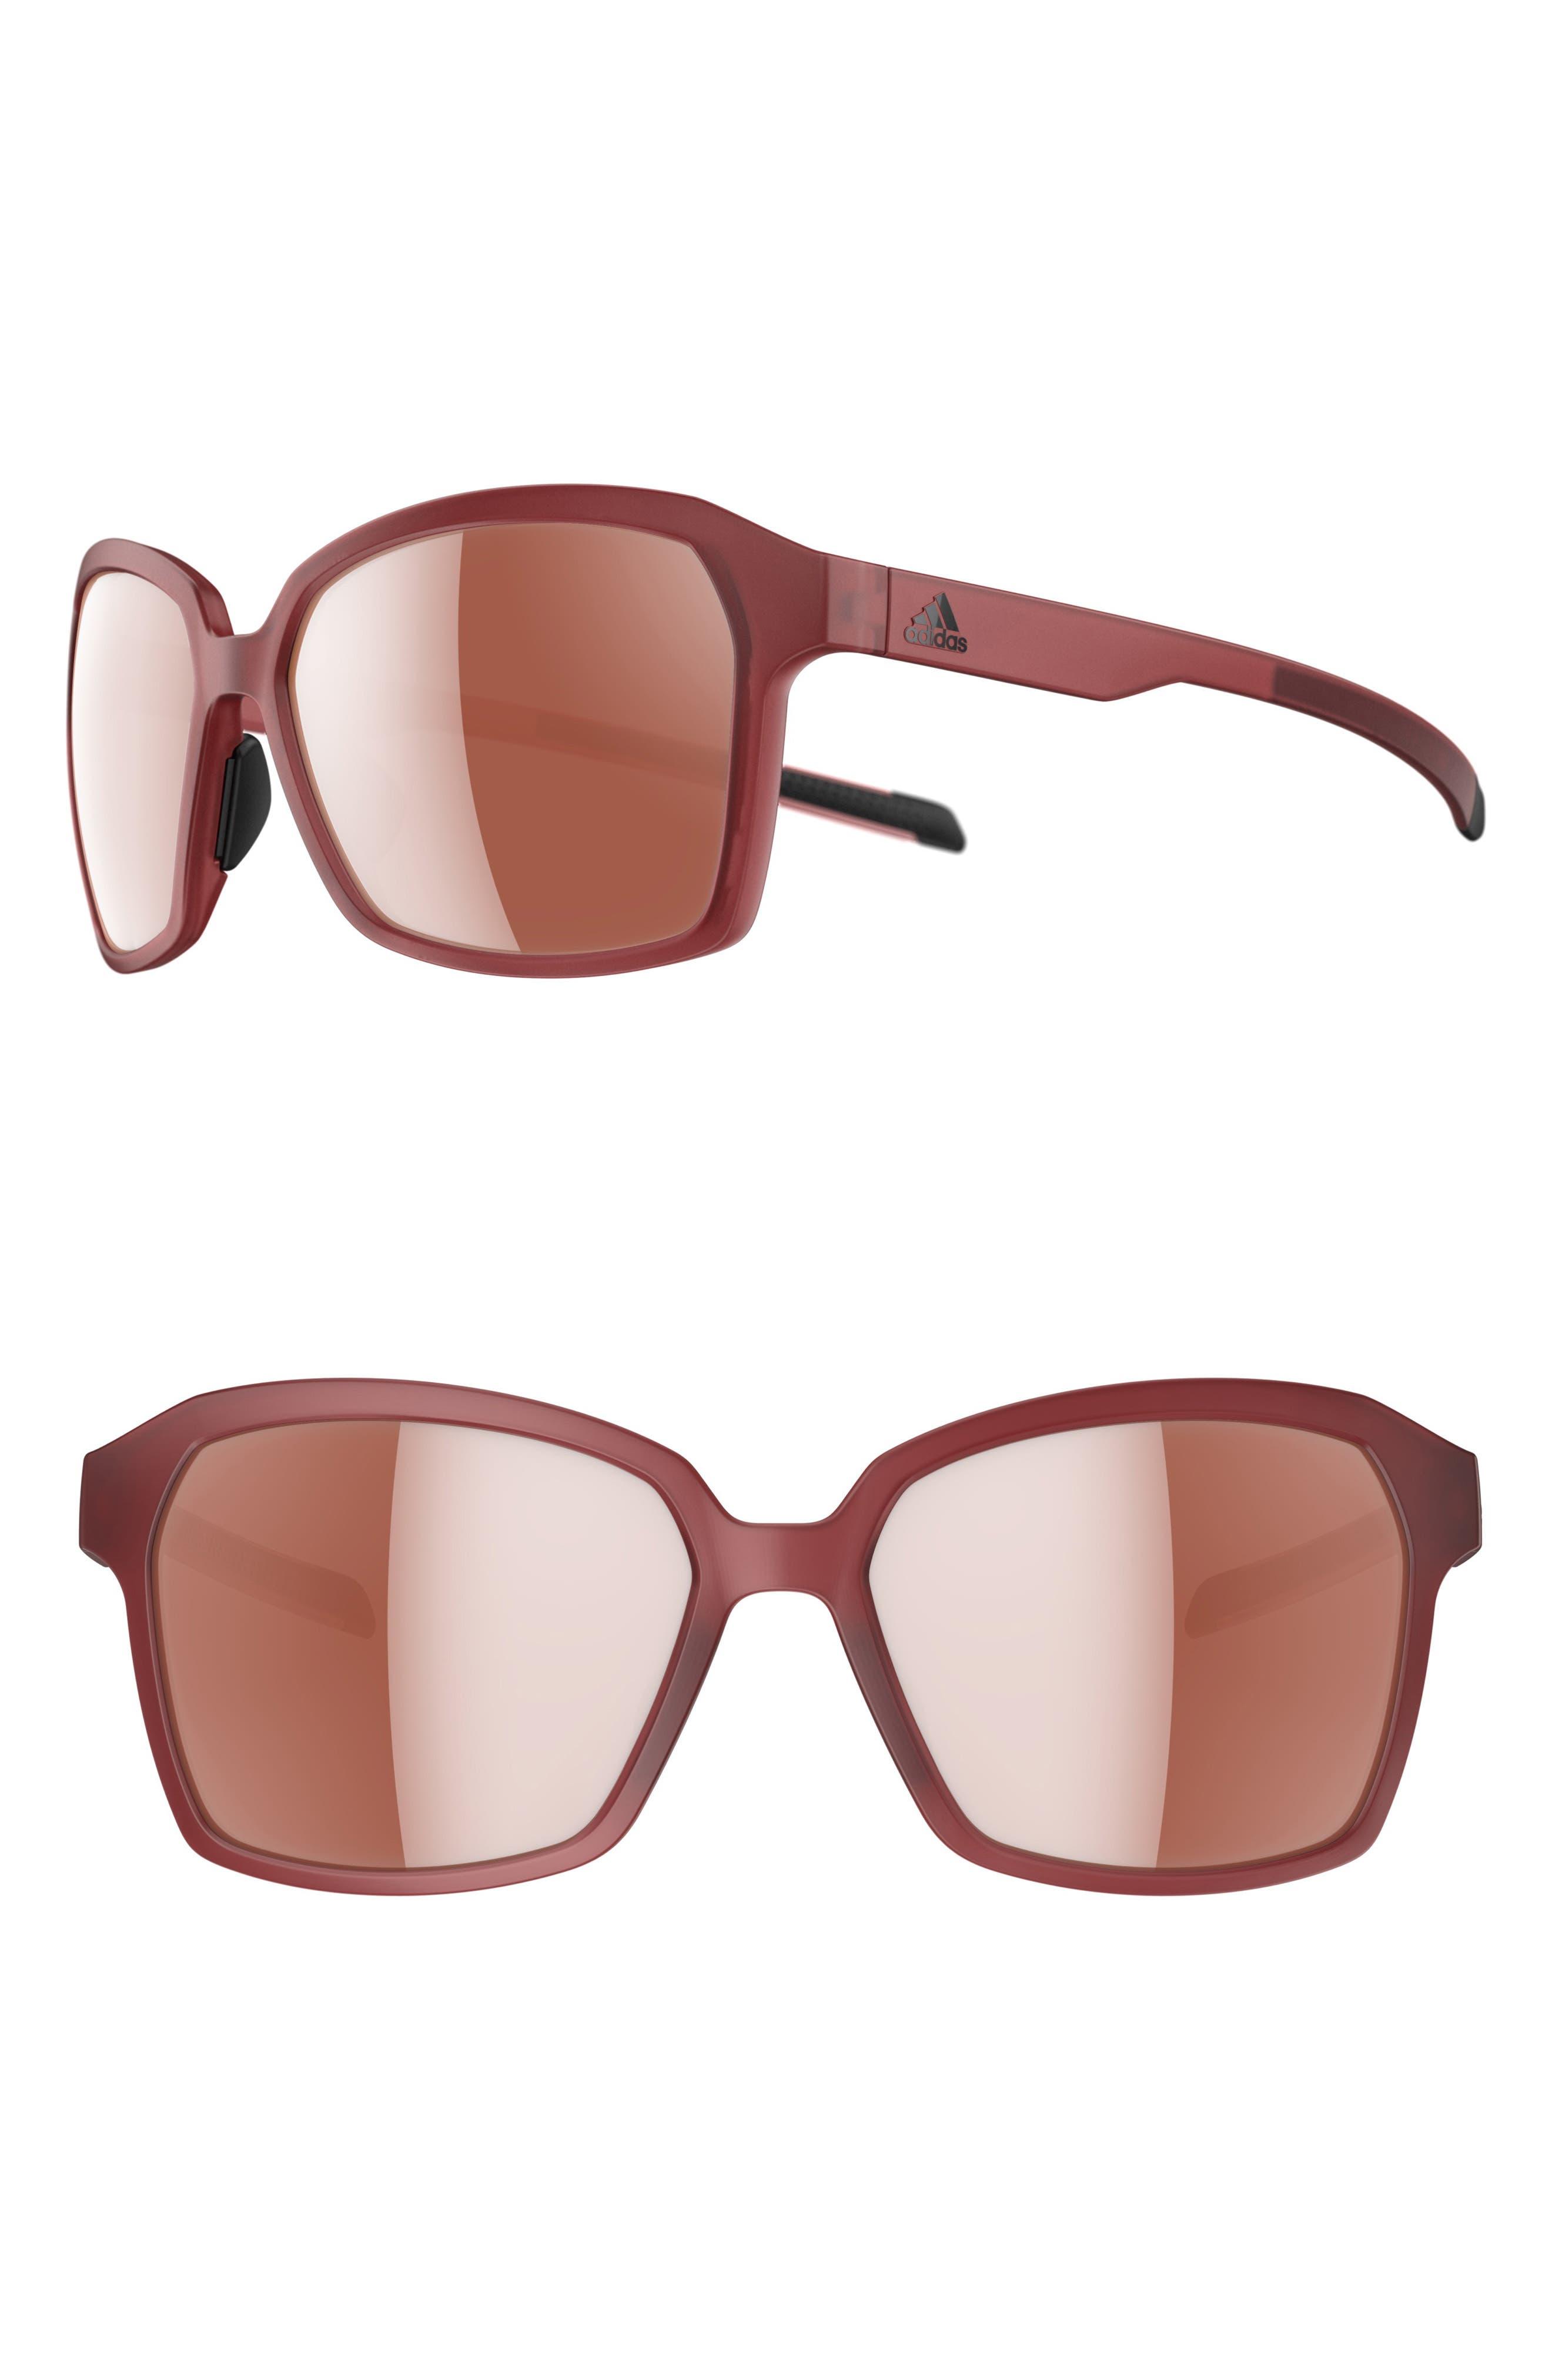 Aspyr Lst 58mm Sunglasses,                         Main,                         color, TRACE MAROON MATTE/SILVER